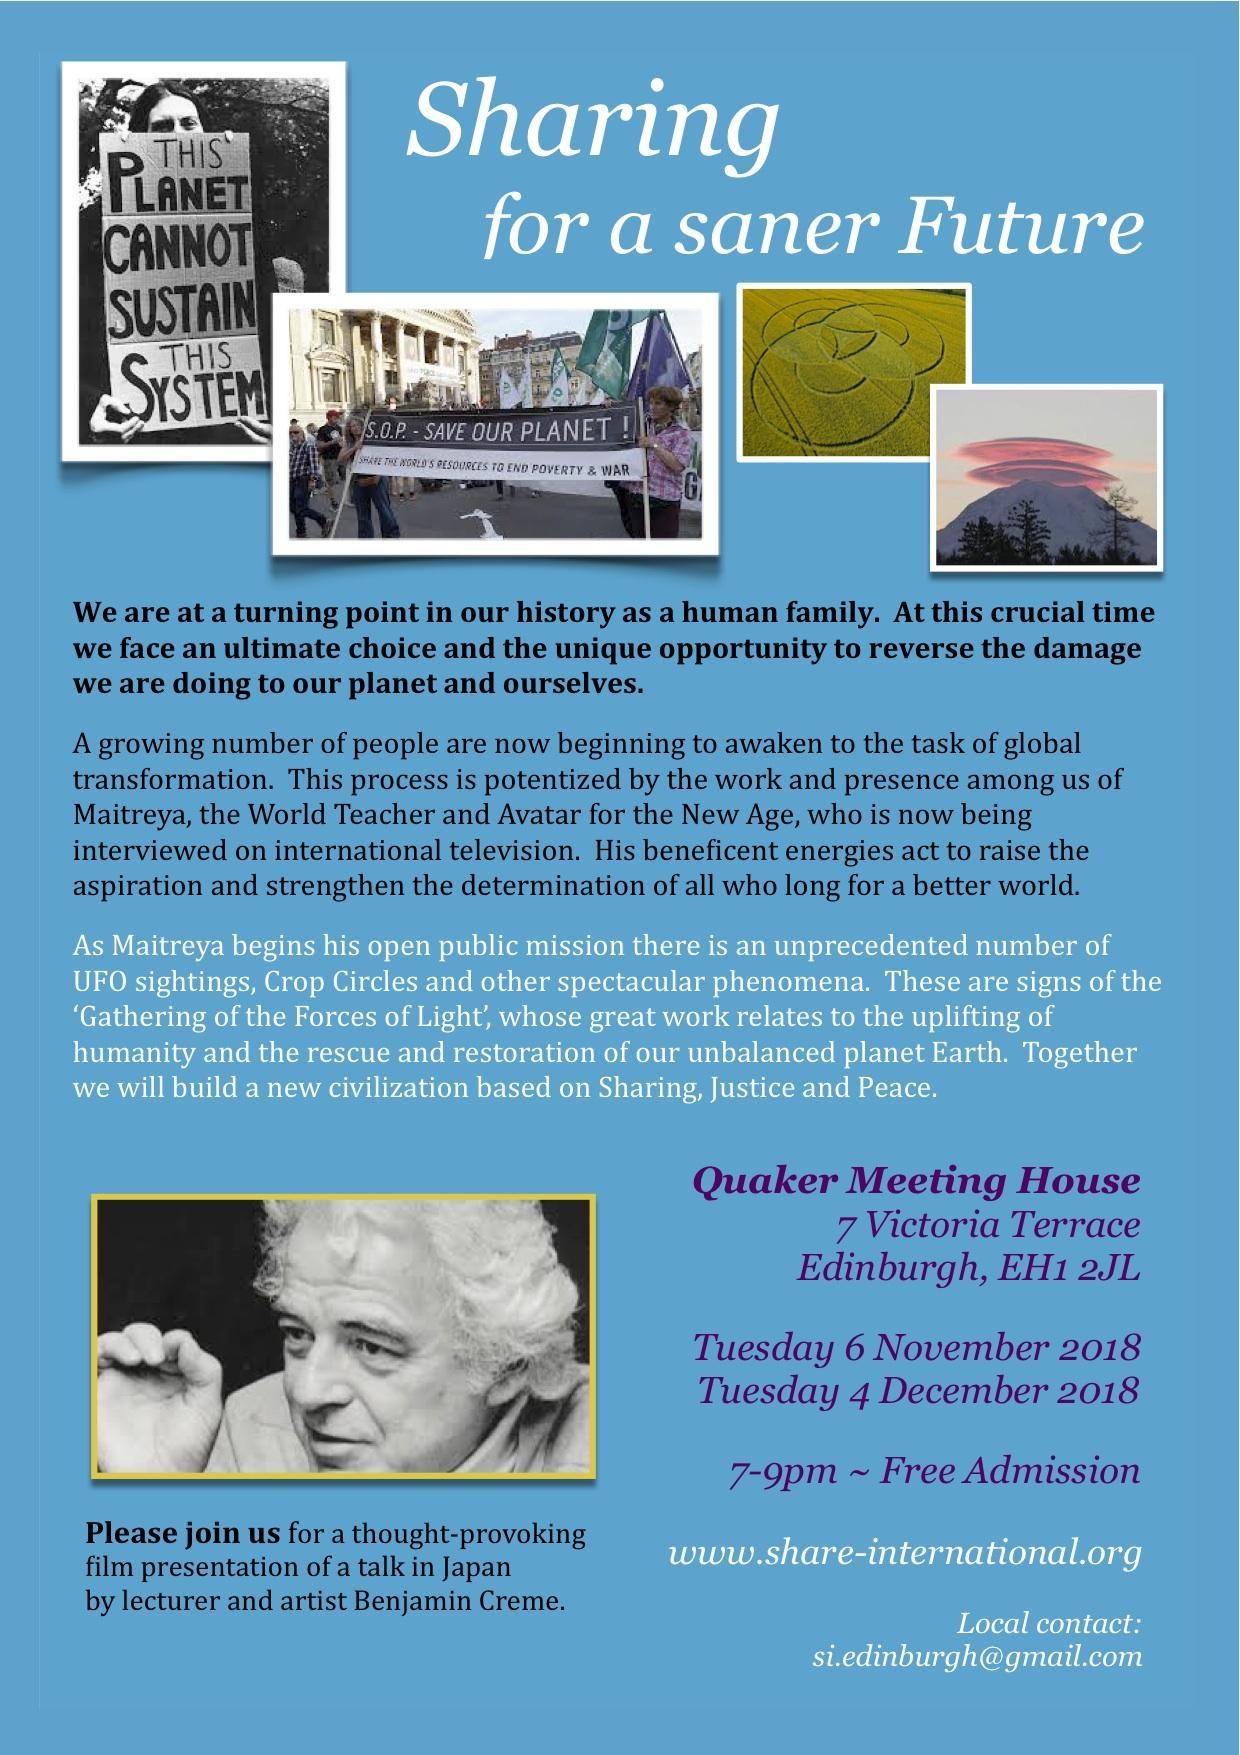 Sharing For A Saner Future Film Presentation Quaker Meeting Transmissive 8211 Working Event Flyer